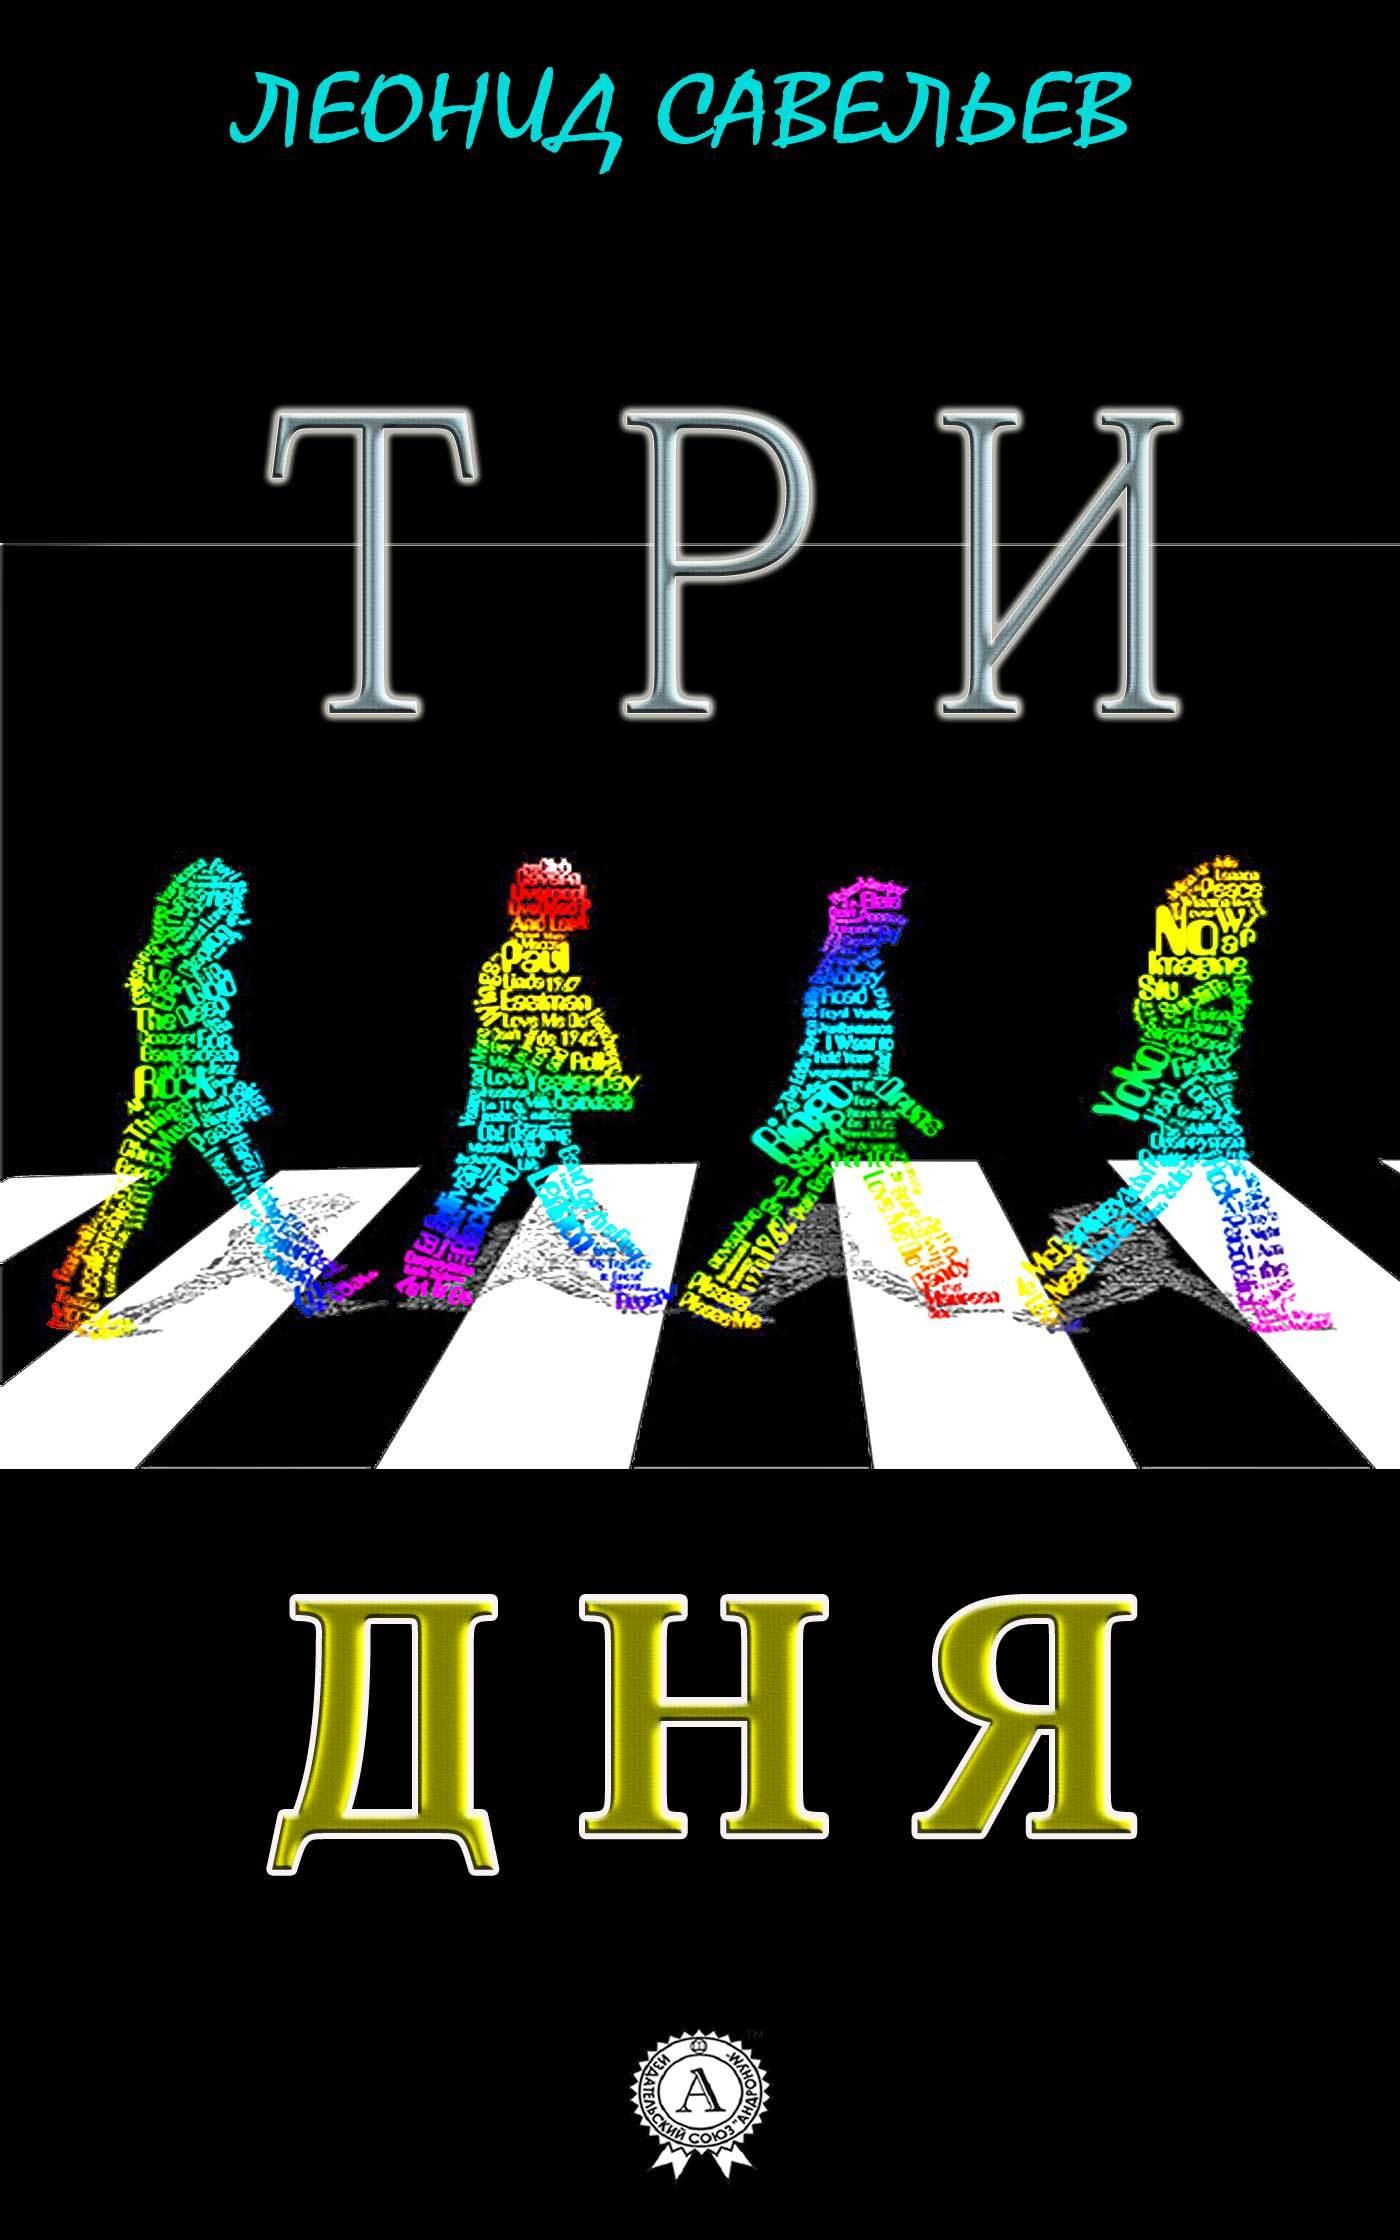 Леонид Савельев Три дня андрей валерьевич юдин три дня вродном городе повести